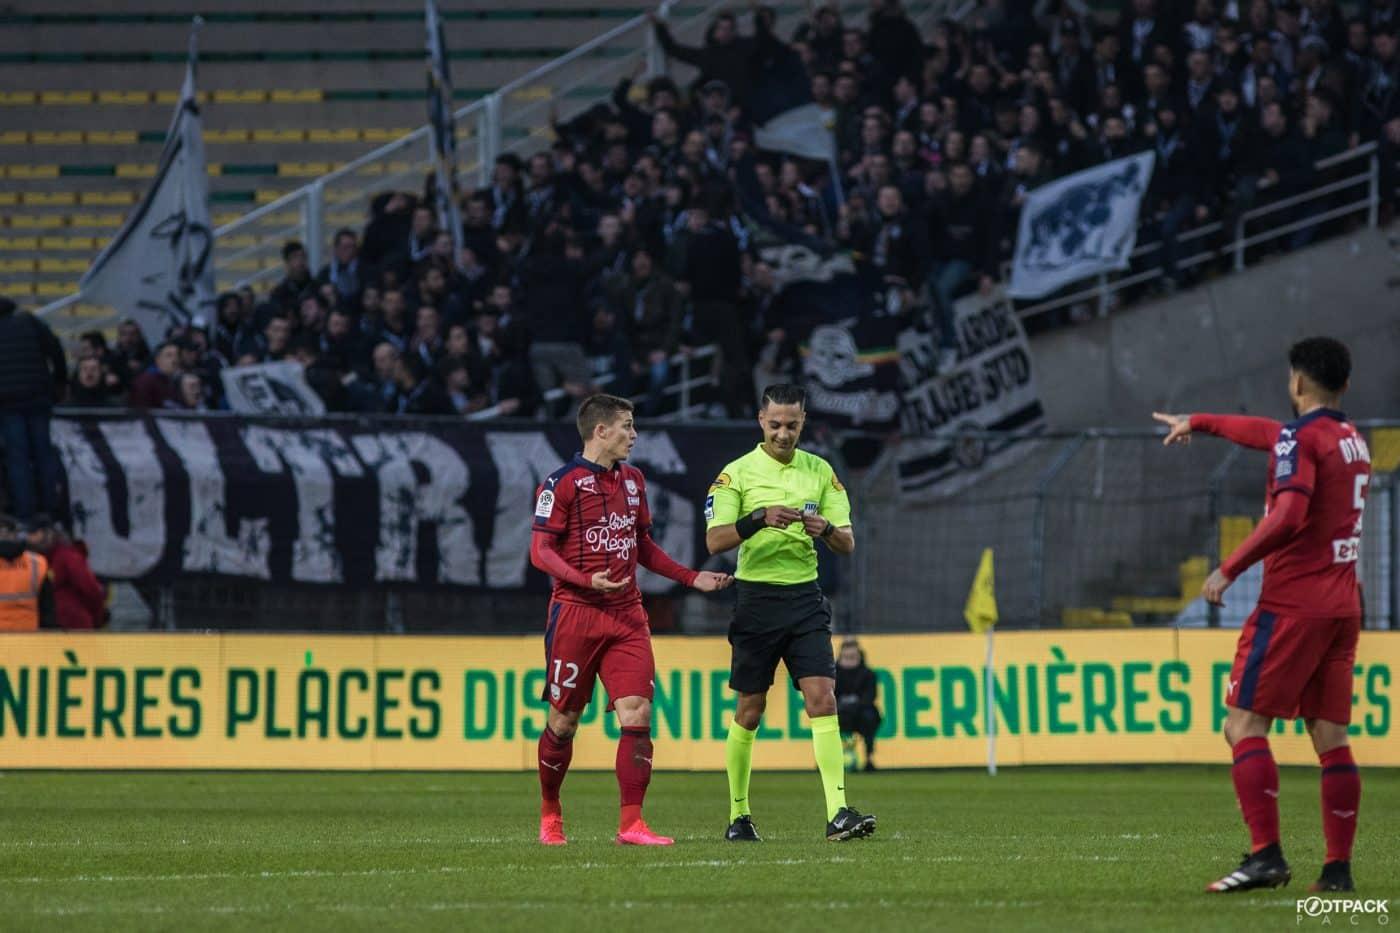 au-stade-fc-nantes-girondins-bordeaux-hommage-sala-35